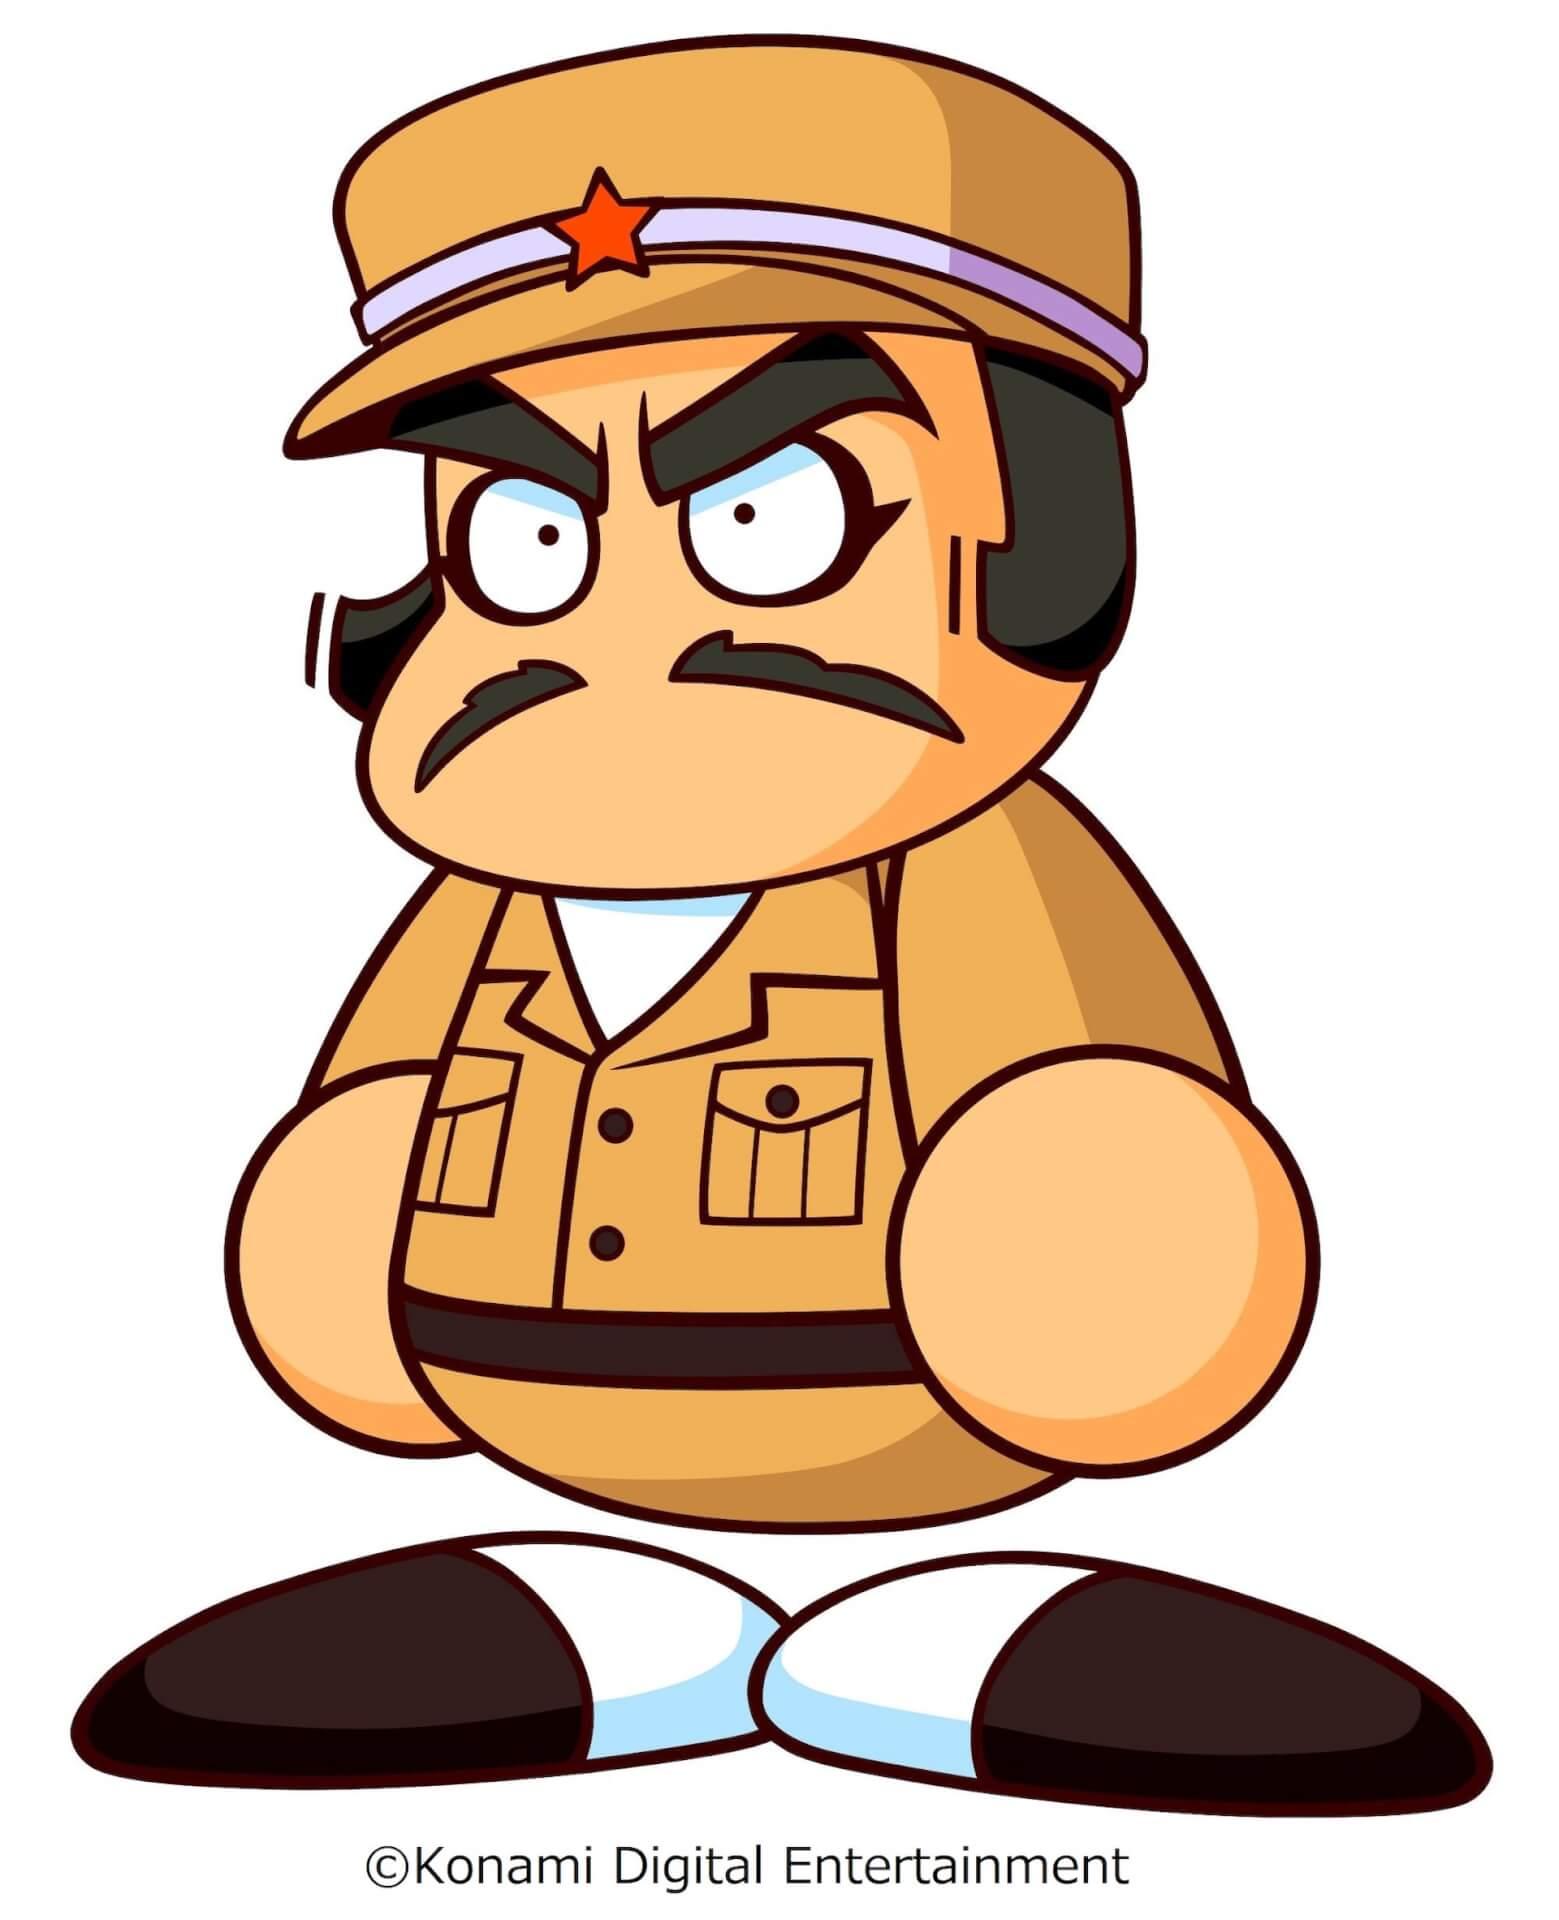 Nintendo Switch『パワプロクンポケットR』の発売日が11月25日に決定!DLCパワポケダッシュも早期購入特典に tech210805_pawapoker_12